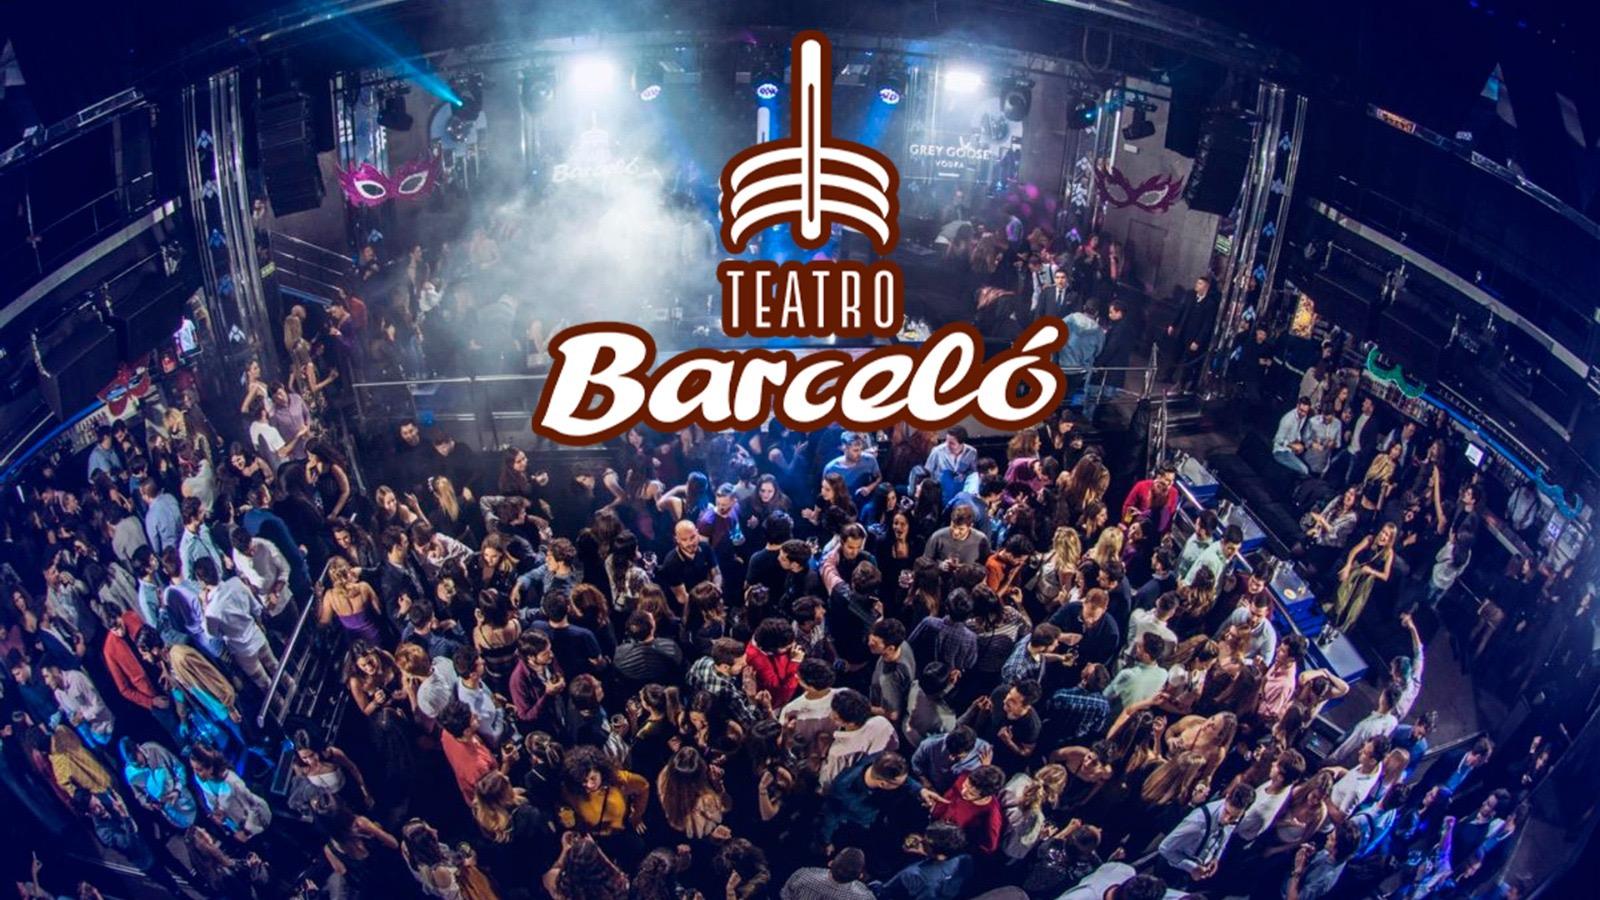 Teatro Barcelo Sábado - Club Teatro Barceló